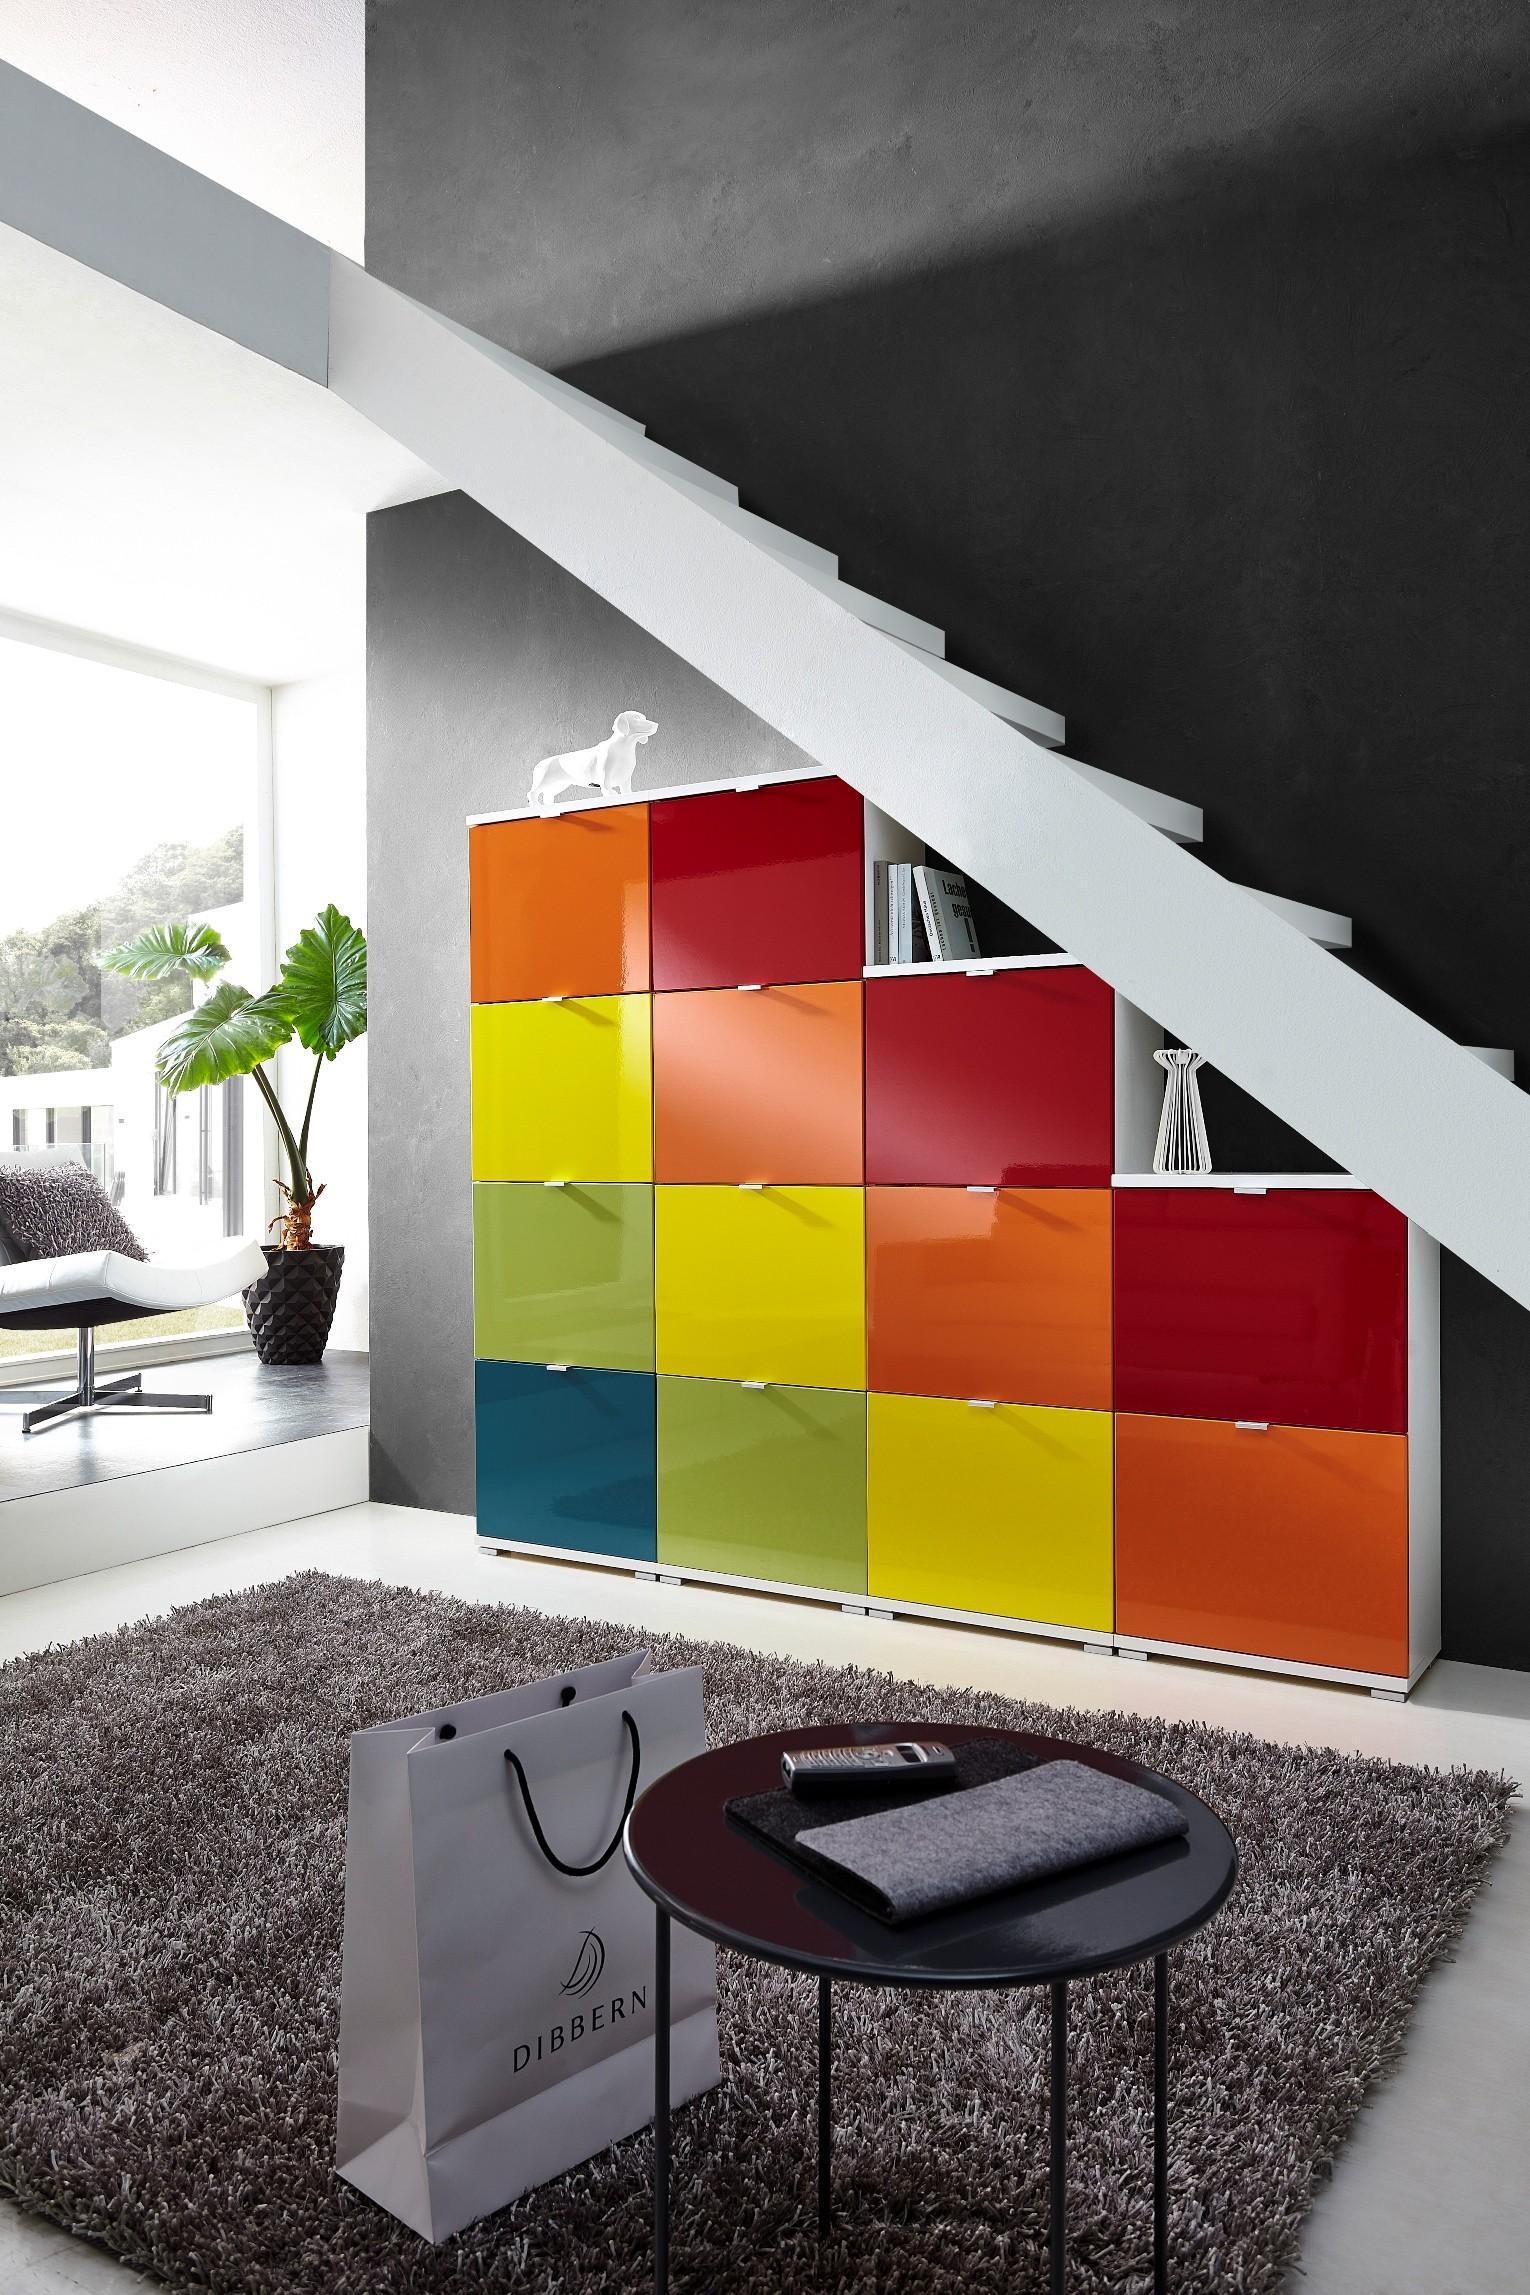 4tlg schuhschranksystem mod gm588 farbig h c m bel for Schuhschrank farbig